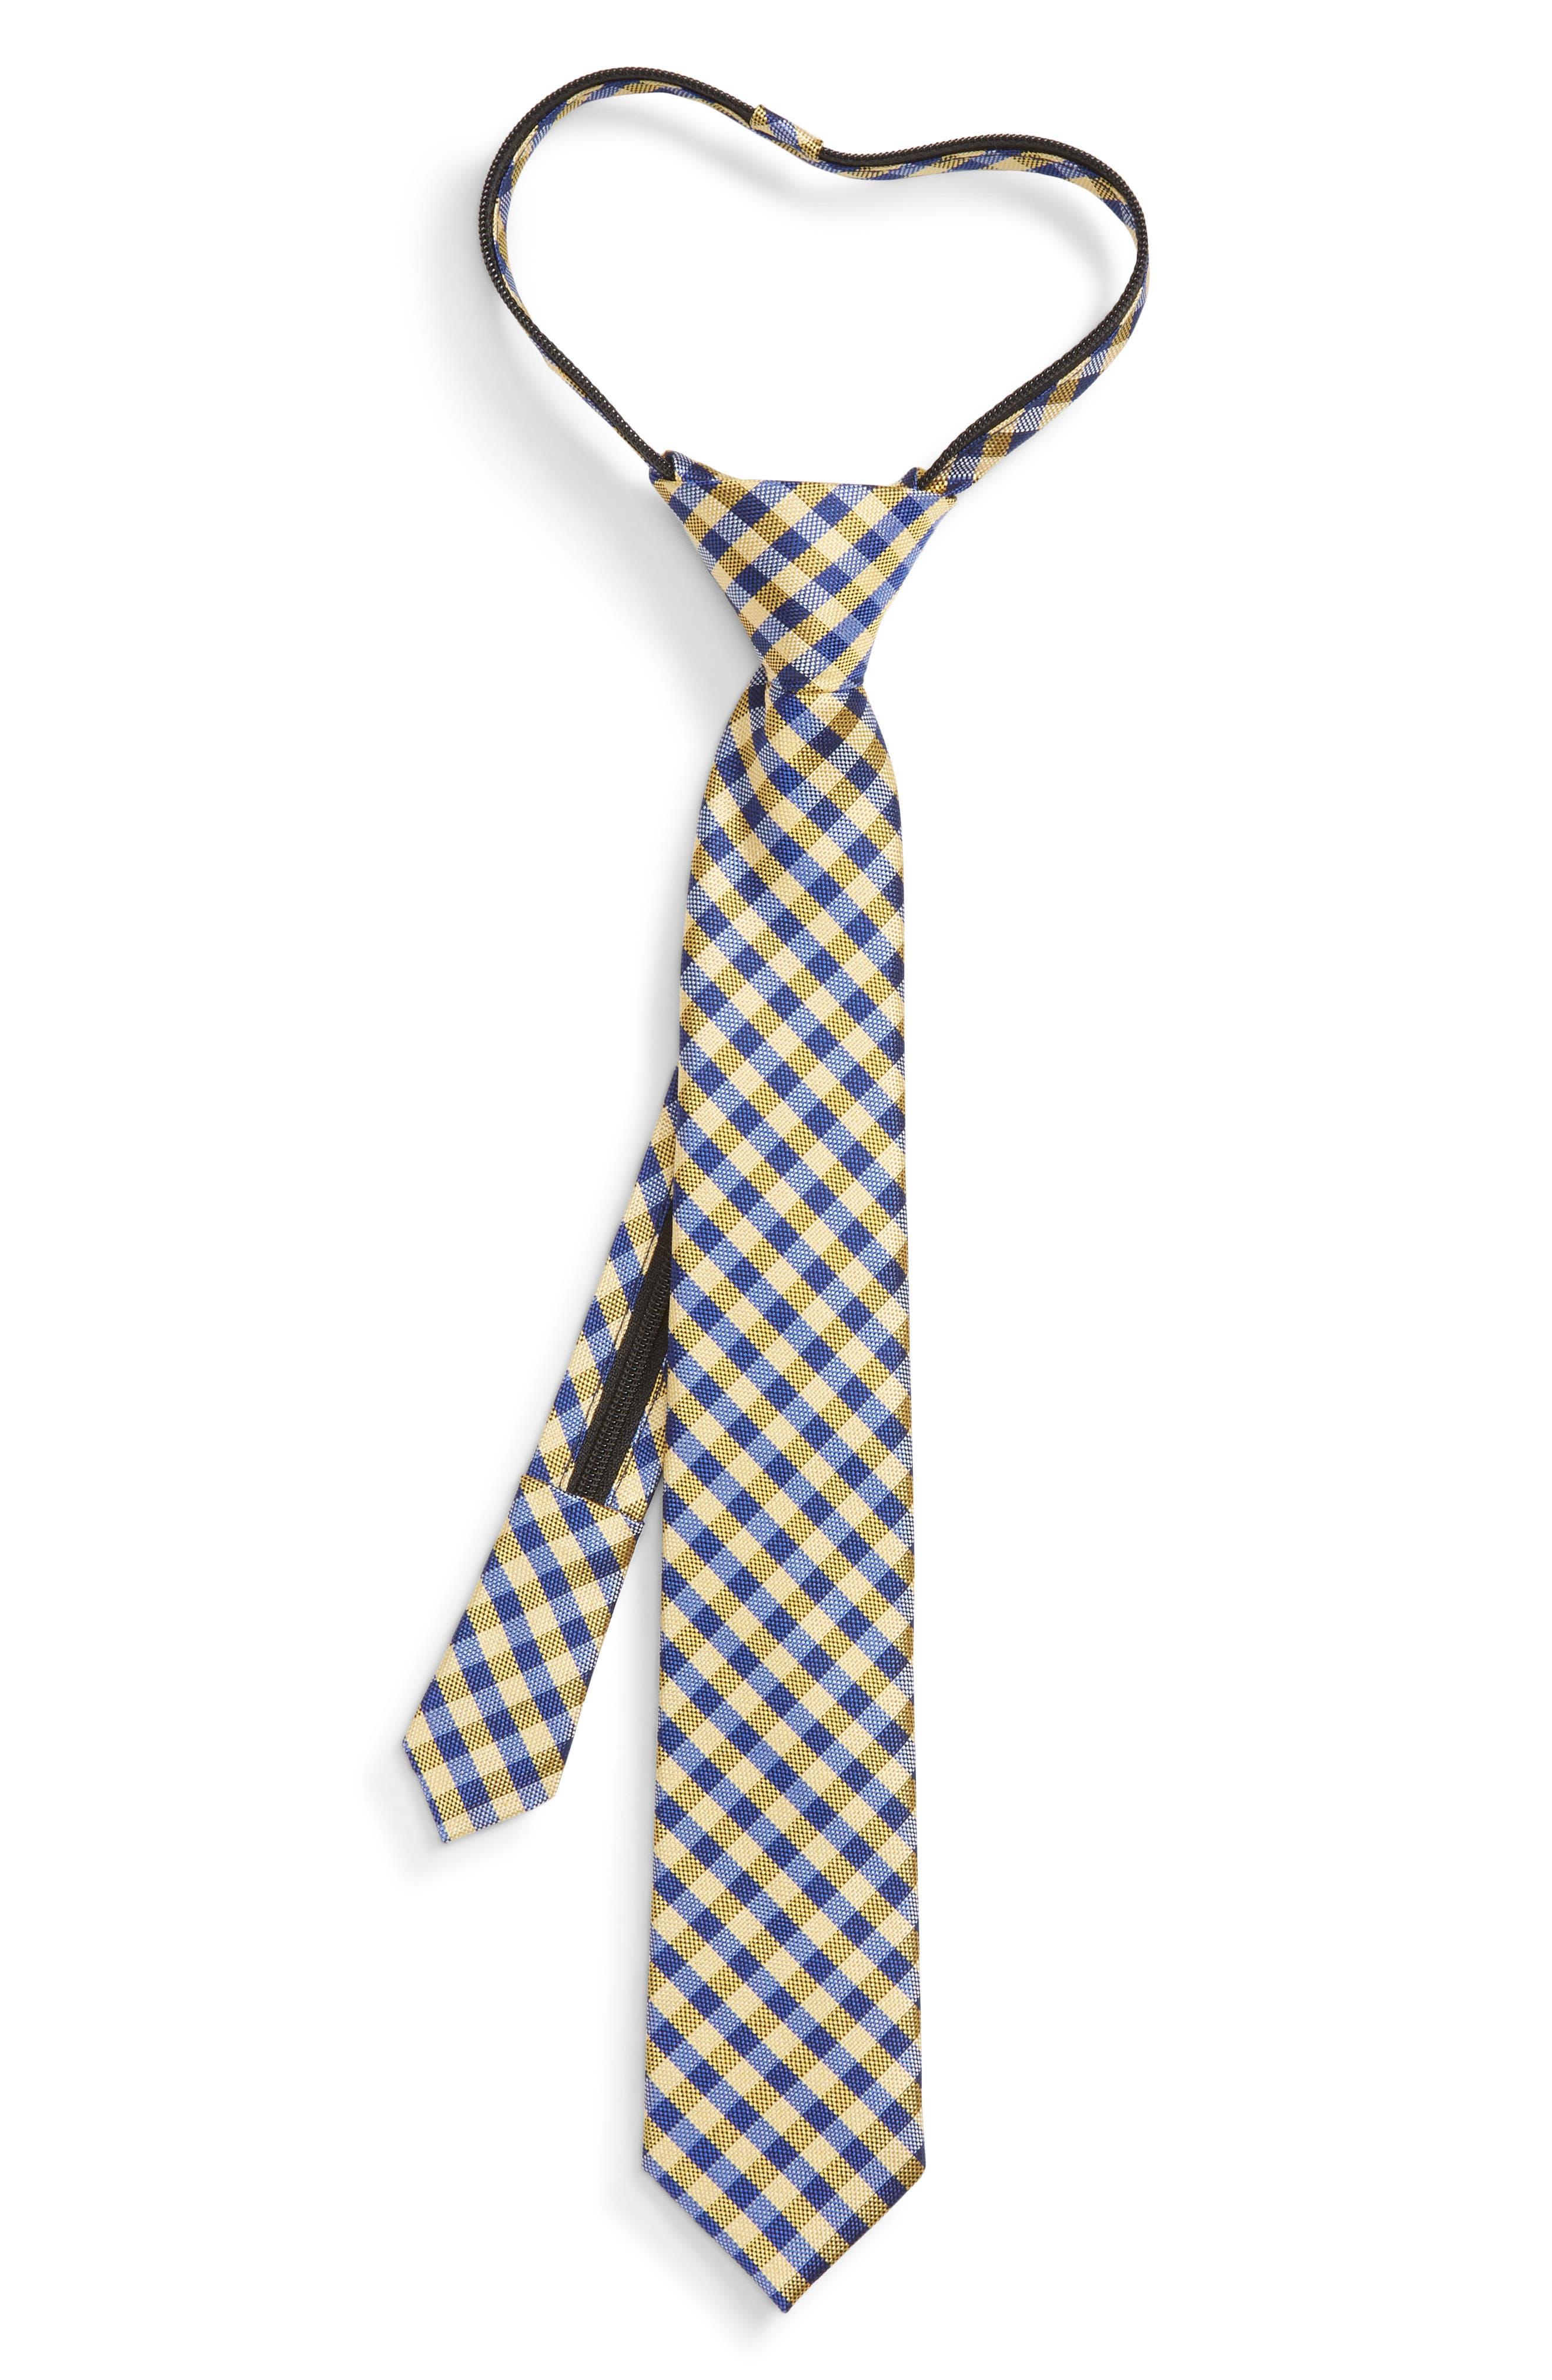 Plaid Silk Zip Tie,                             Main thumbnail 1, color,                             YELLOW